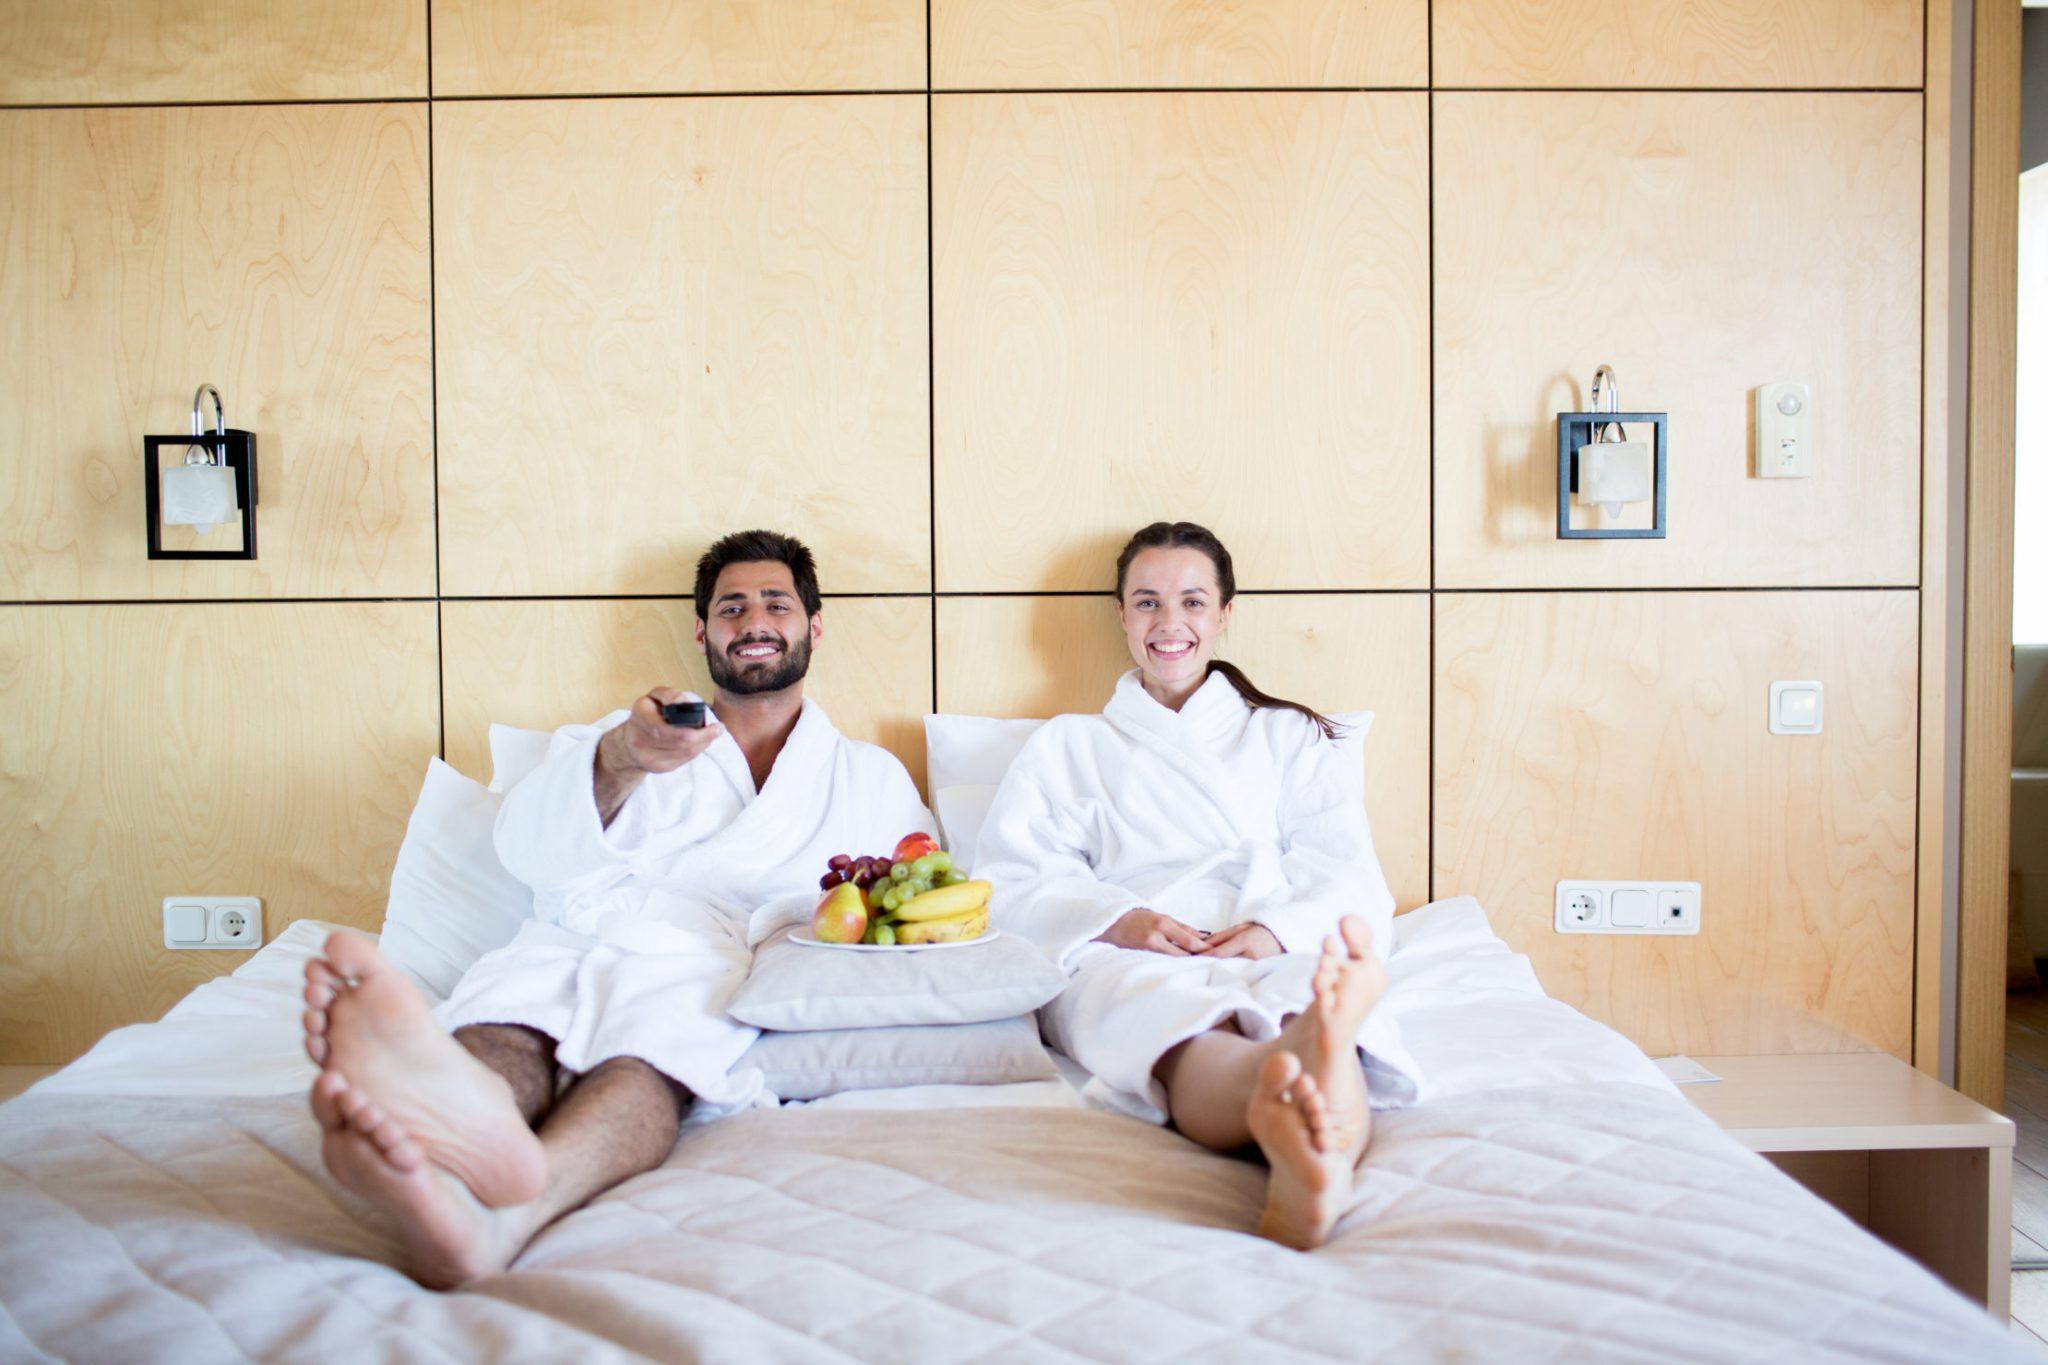 Best Hotels in Prague, Czech Republic - find the best deal